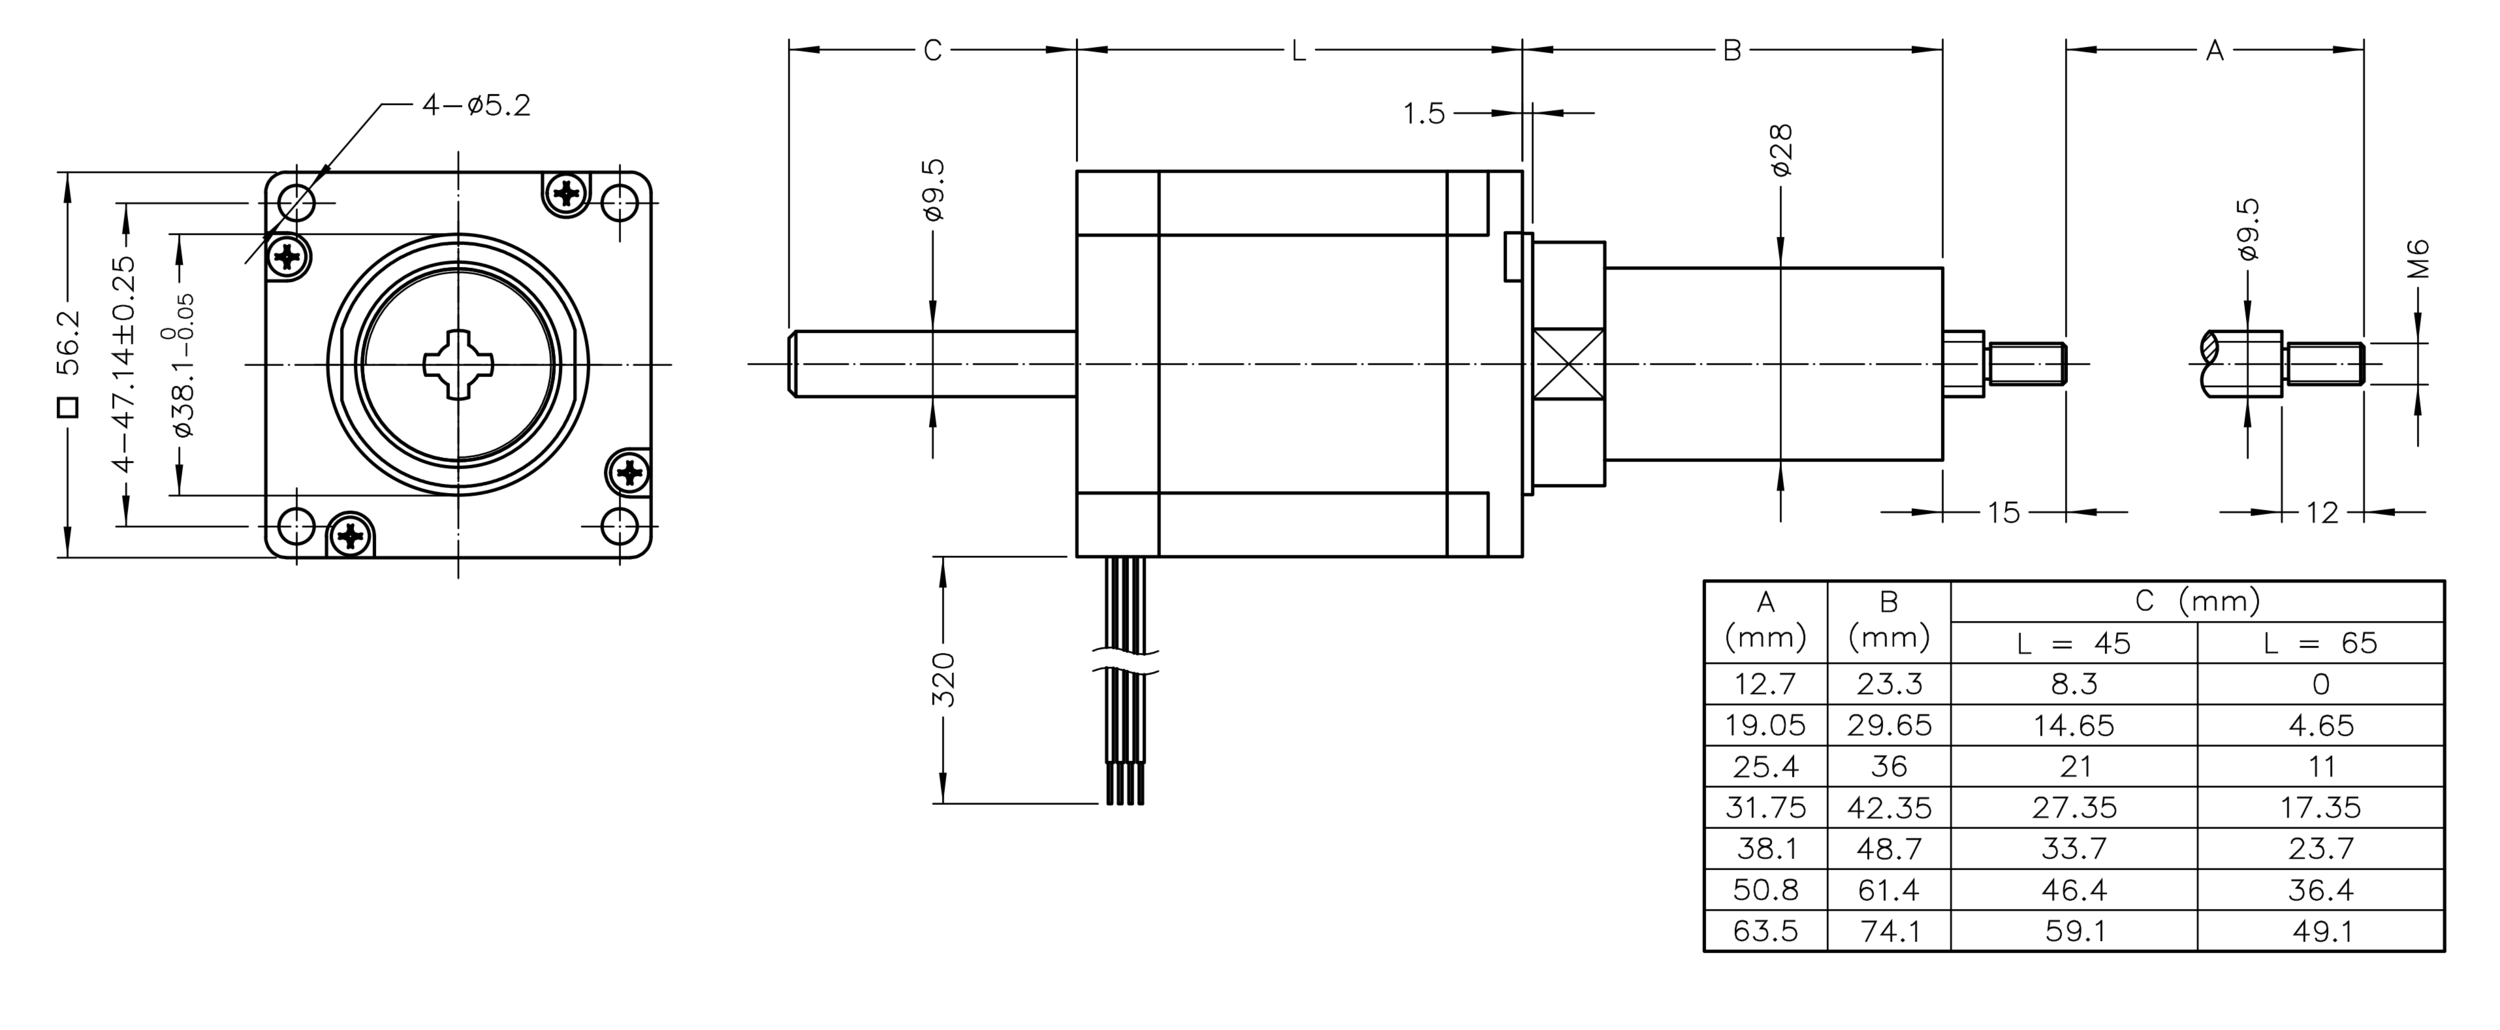 Nema 23 Linear Actuators Koco Motion Actuator Wiring Captive